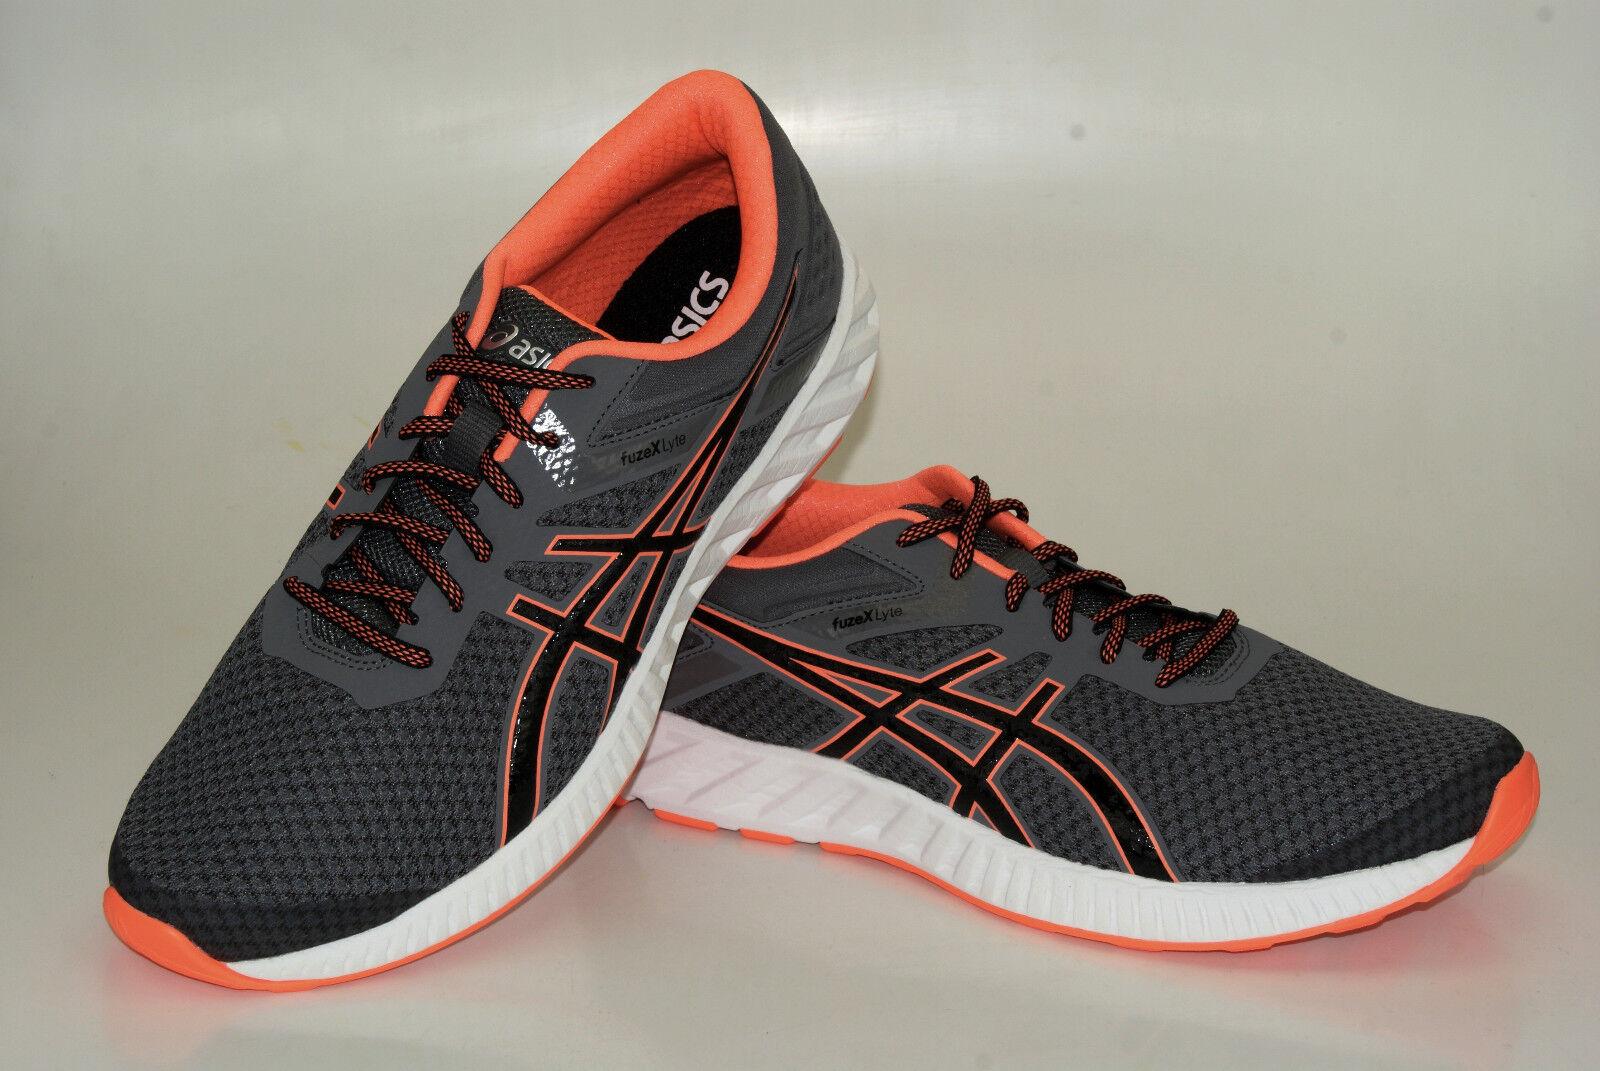 Asics fuzex Lyte 2 zapatillas calzado deportivo zapatillas de deporte caballero zapatillas t719n-9790